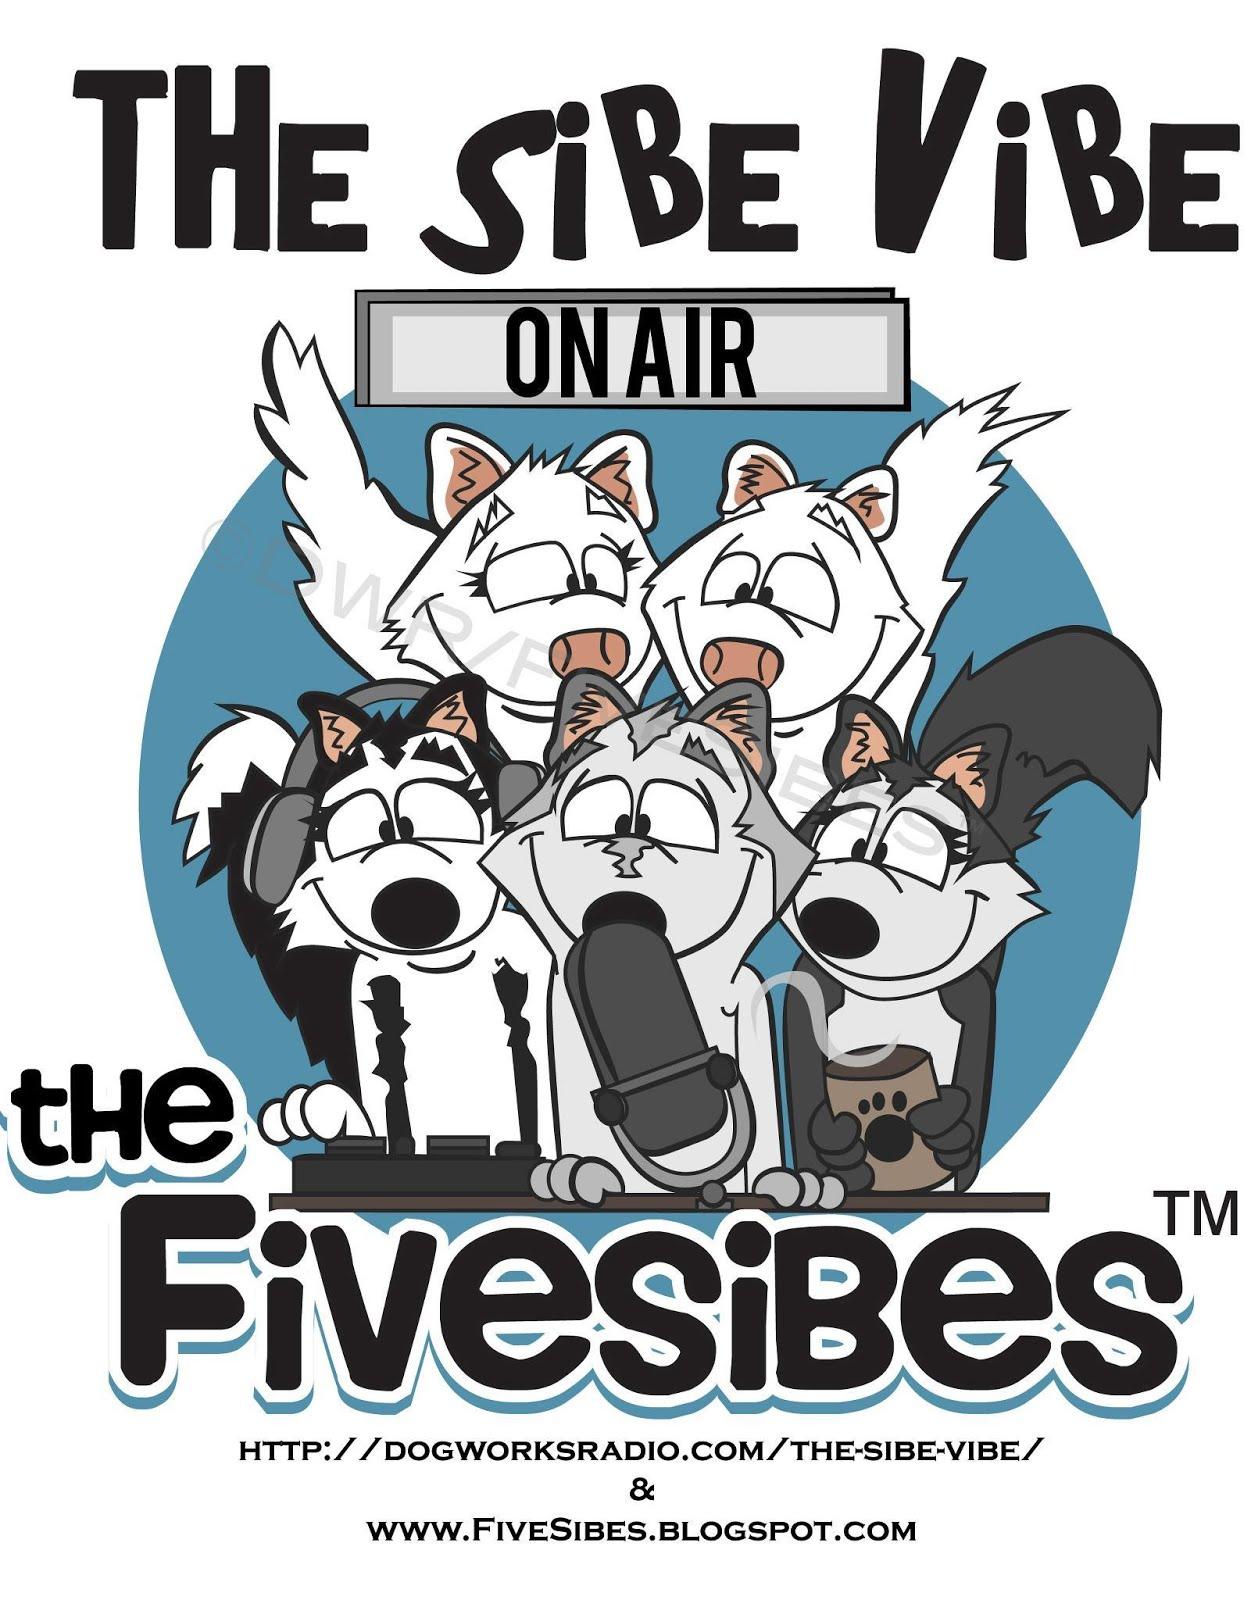 The Sibe Vibe